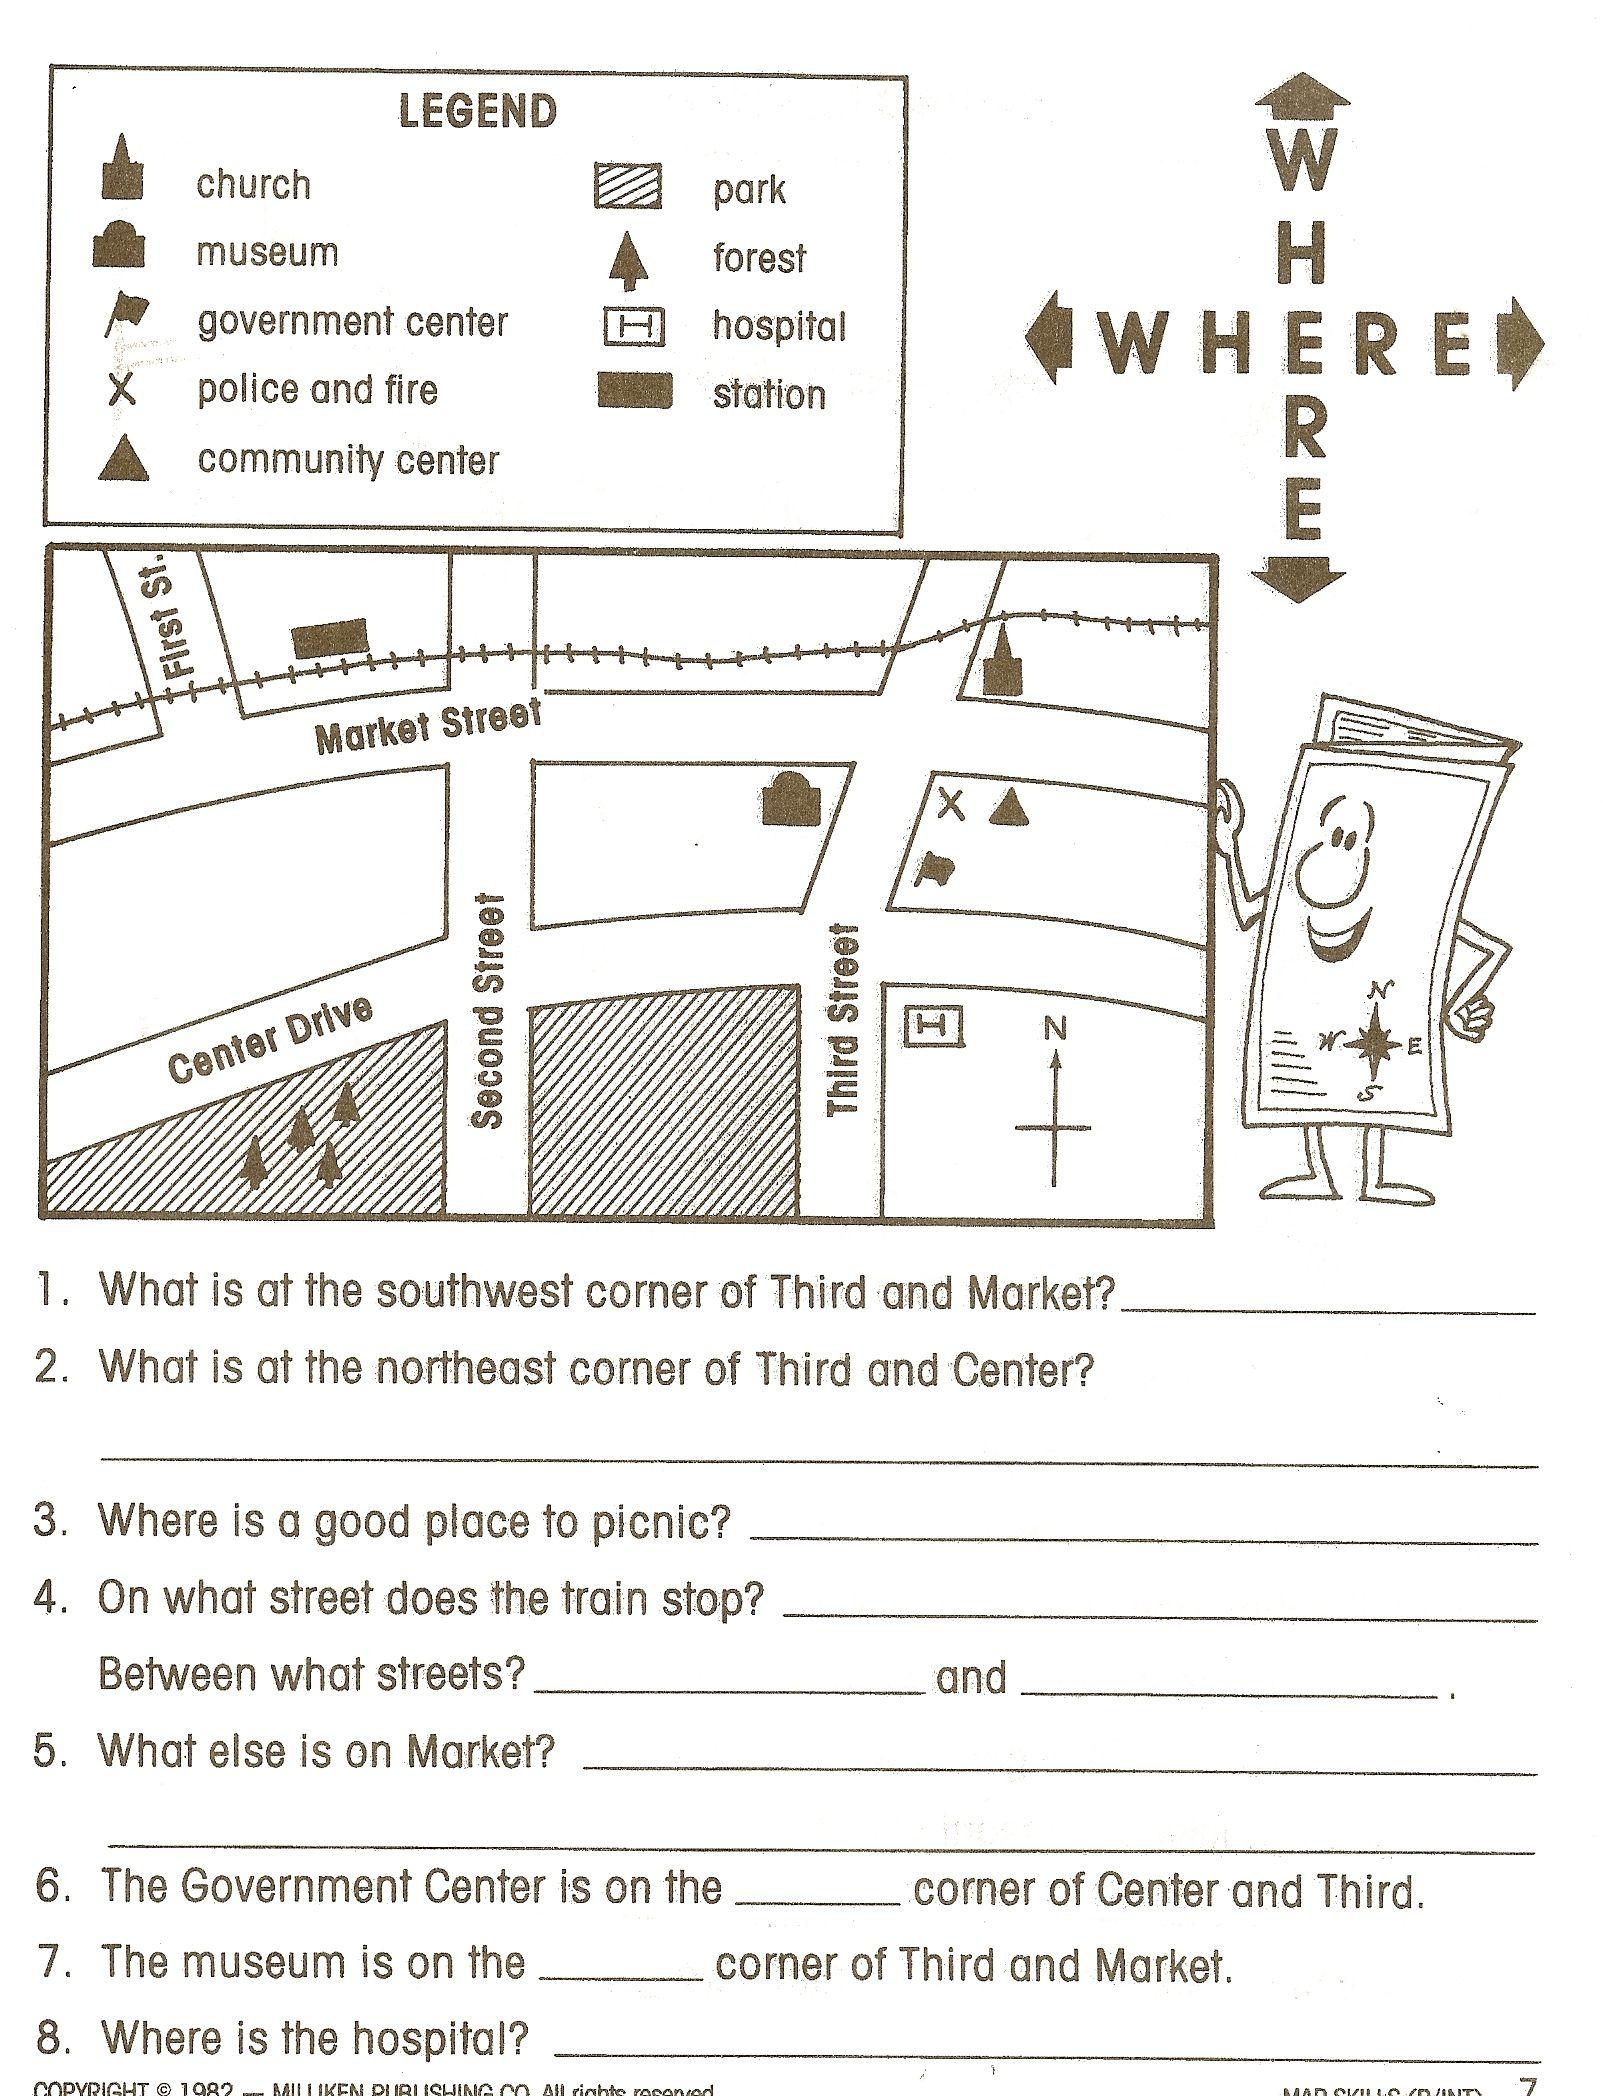 social studies worksheets - Google Search   Map skills [ 2096 x 1603 Pixel ]